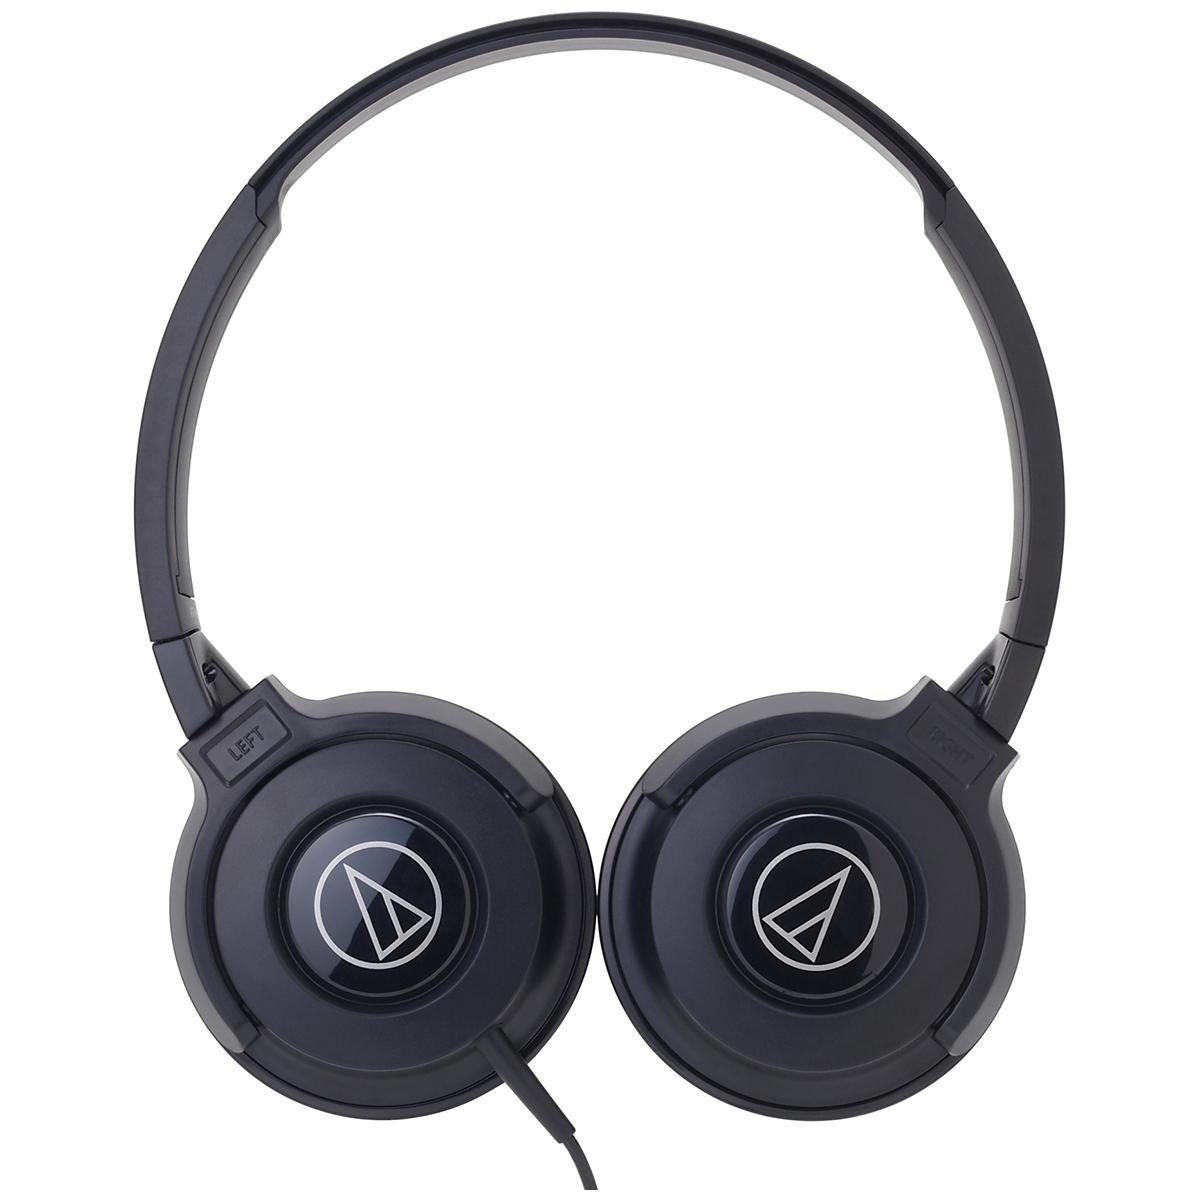 Audio-technica Headphone + USB Microphone Bundle ATR2100X/ATH-S100 image 2